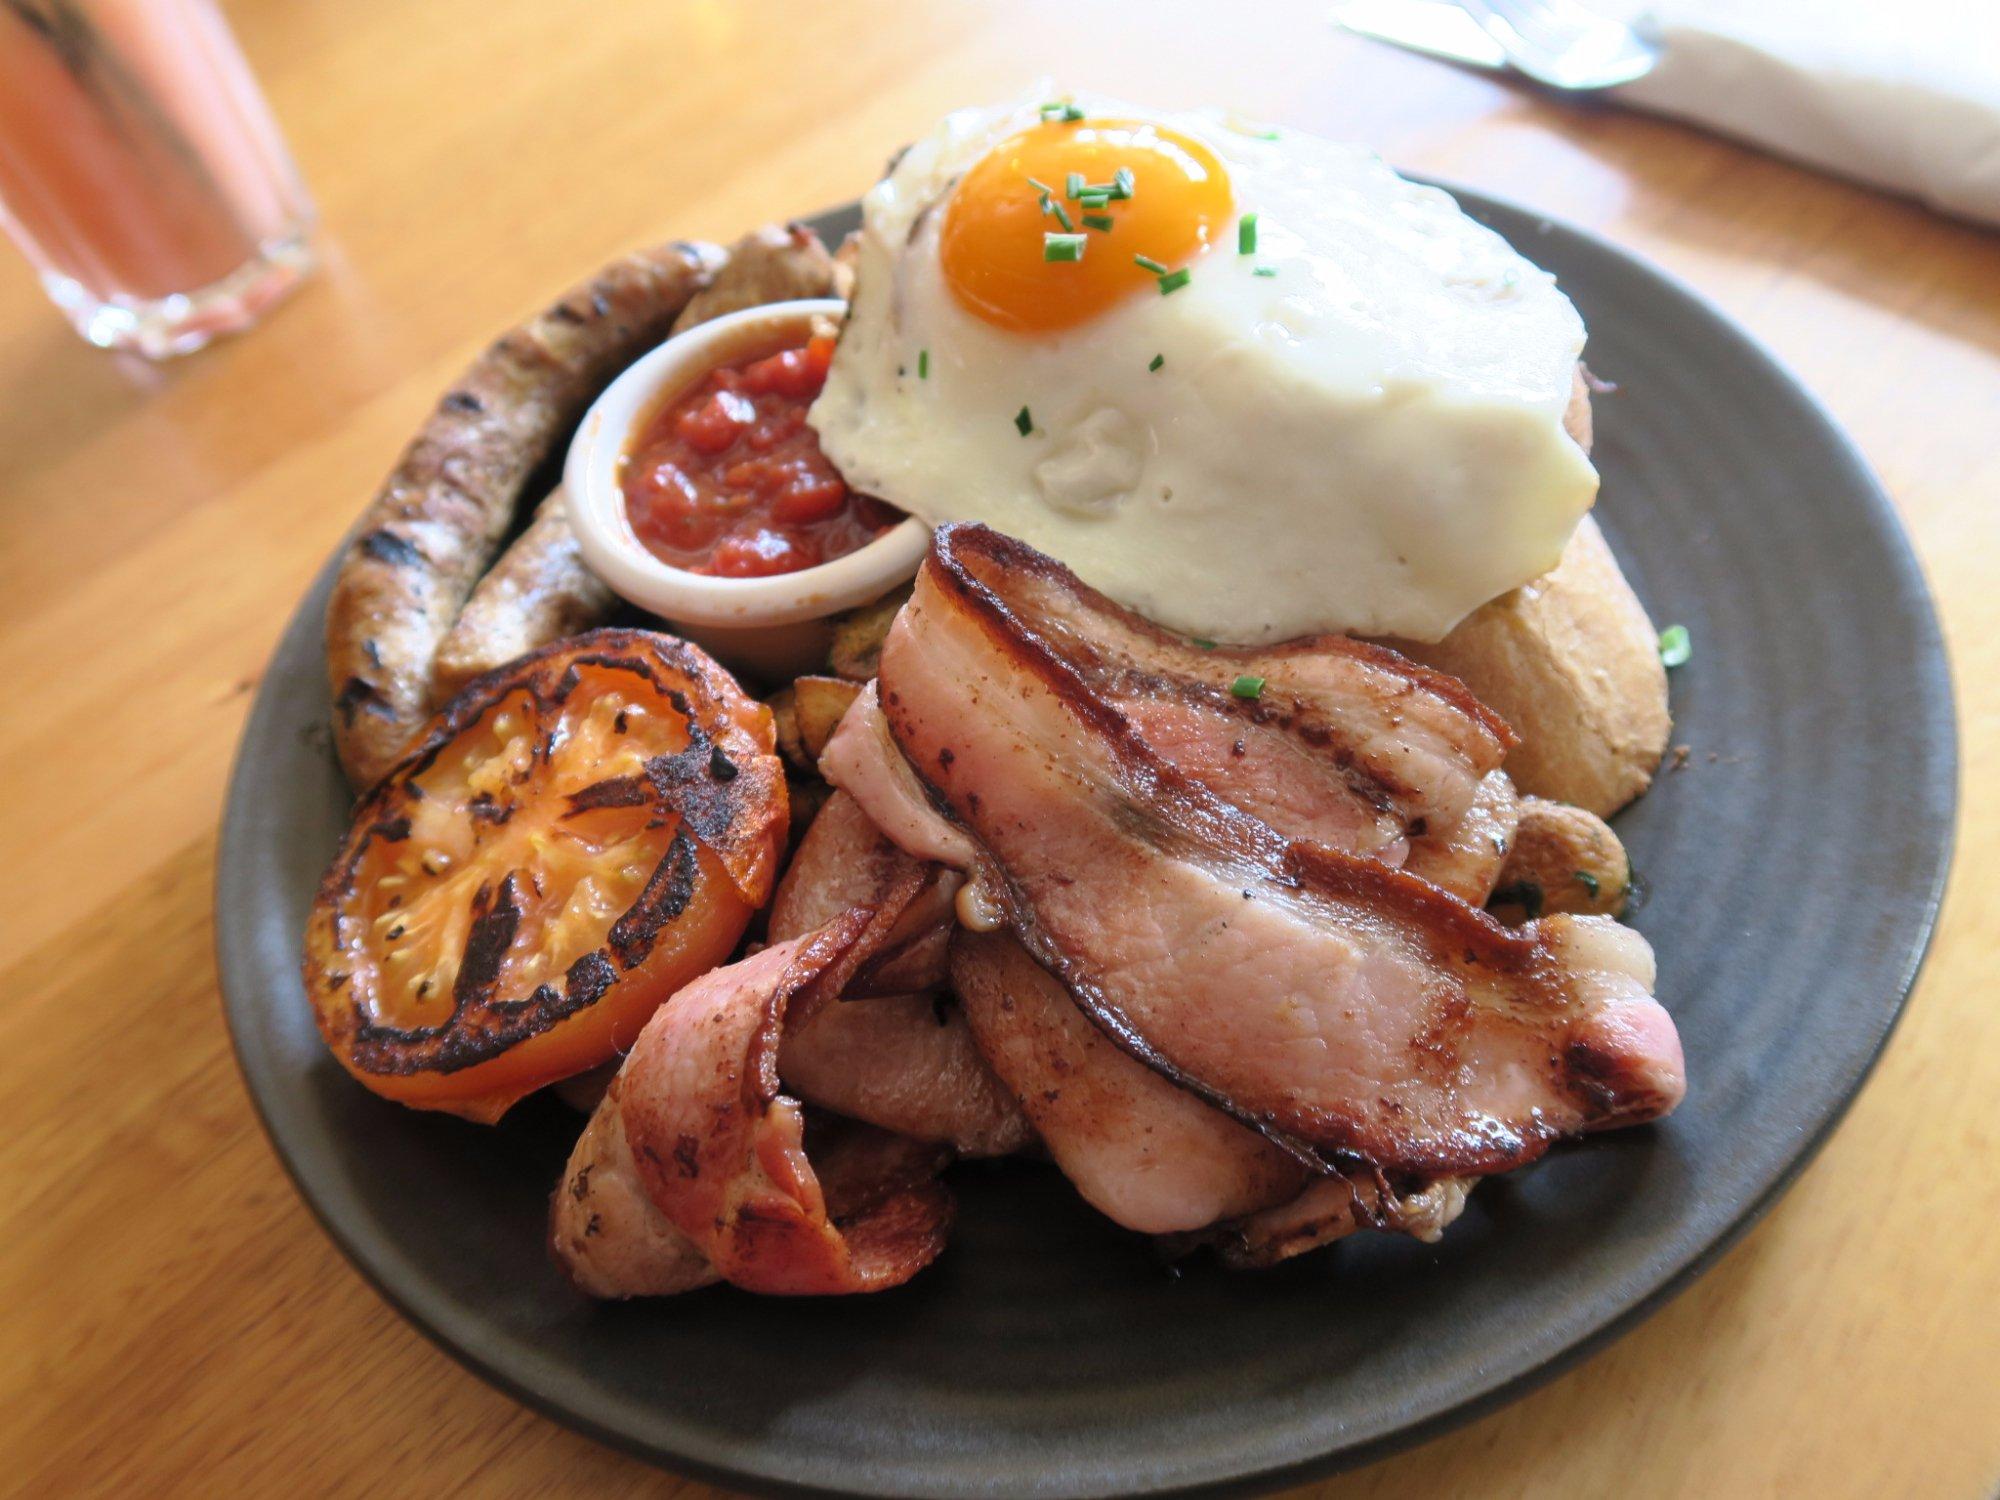 New South Wales, Australia Food Guide: 7 Australian food Must-Eat Restaurants & Street Food Stalls in Bungendore